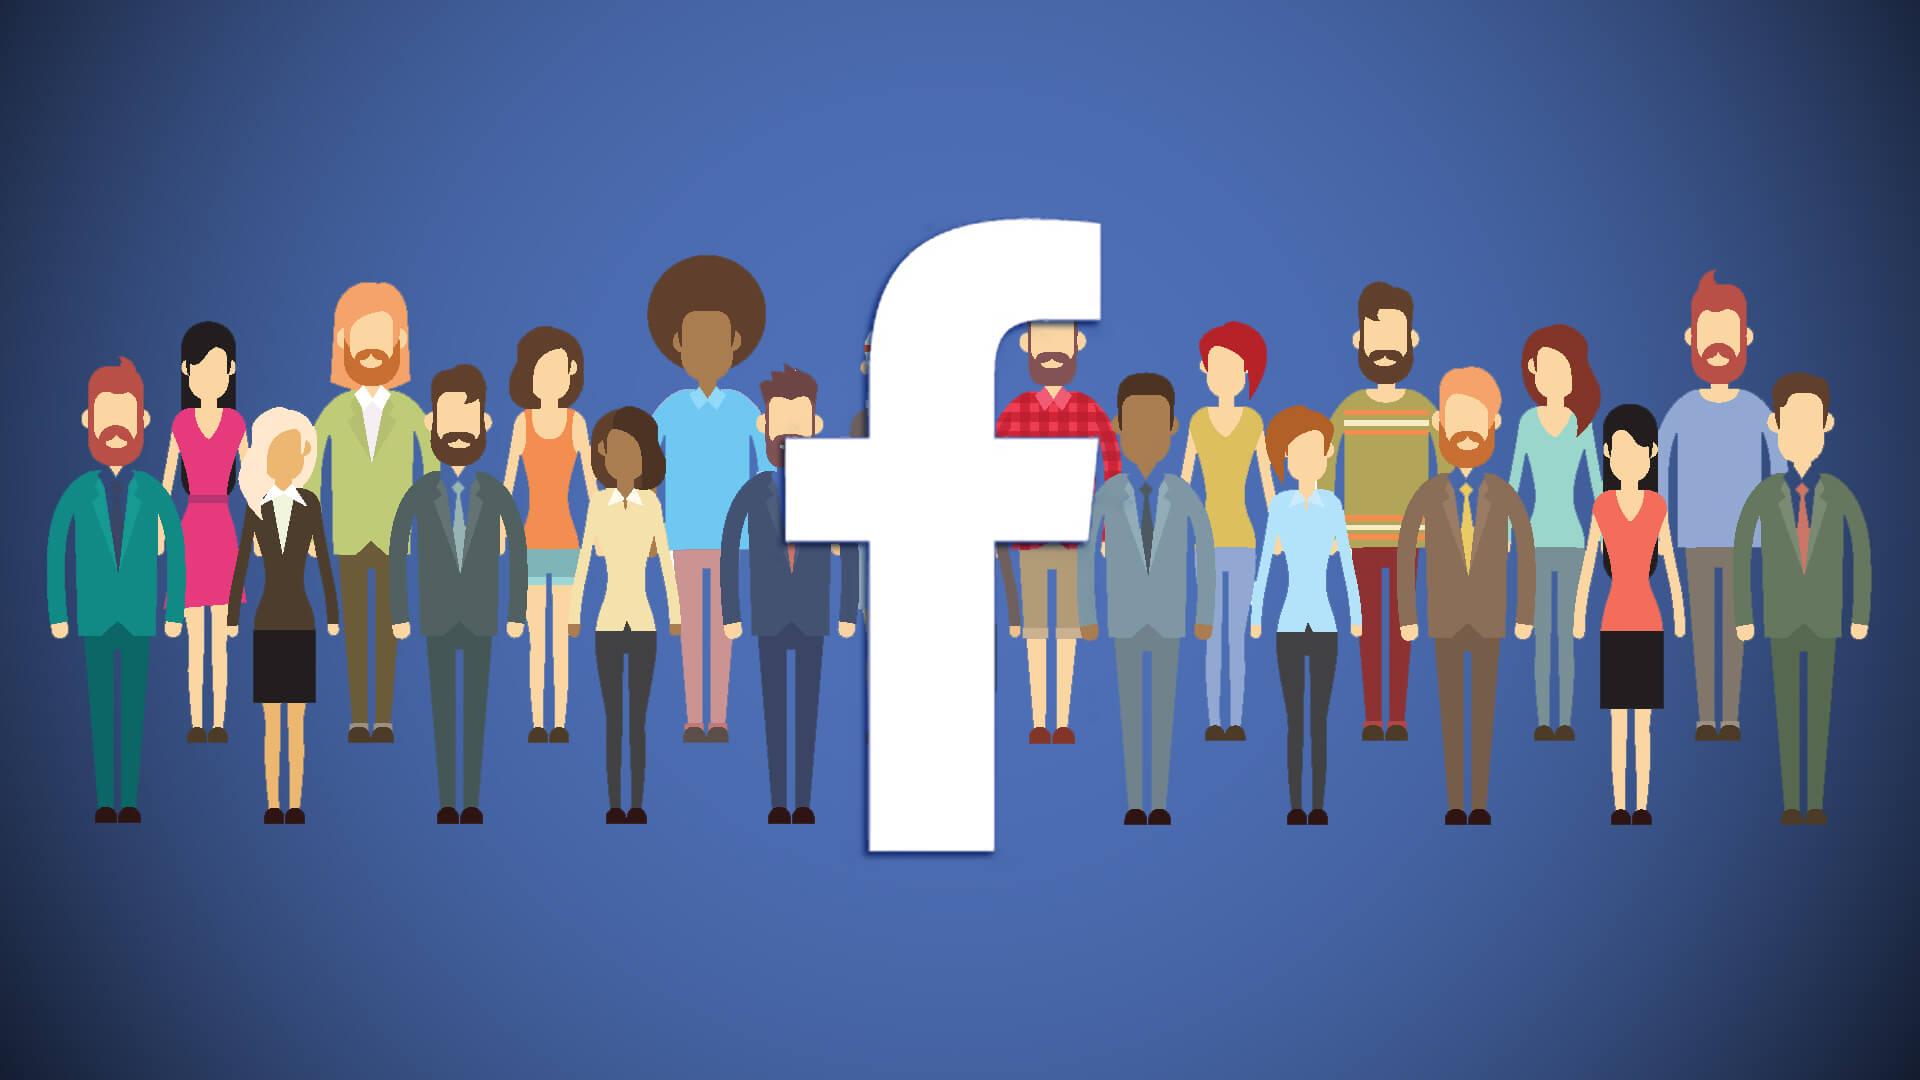 The Break Up Of The Social Media Giant - Facebook